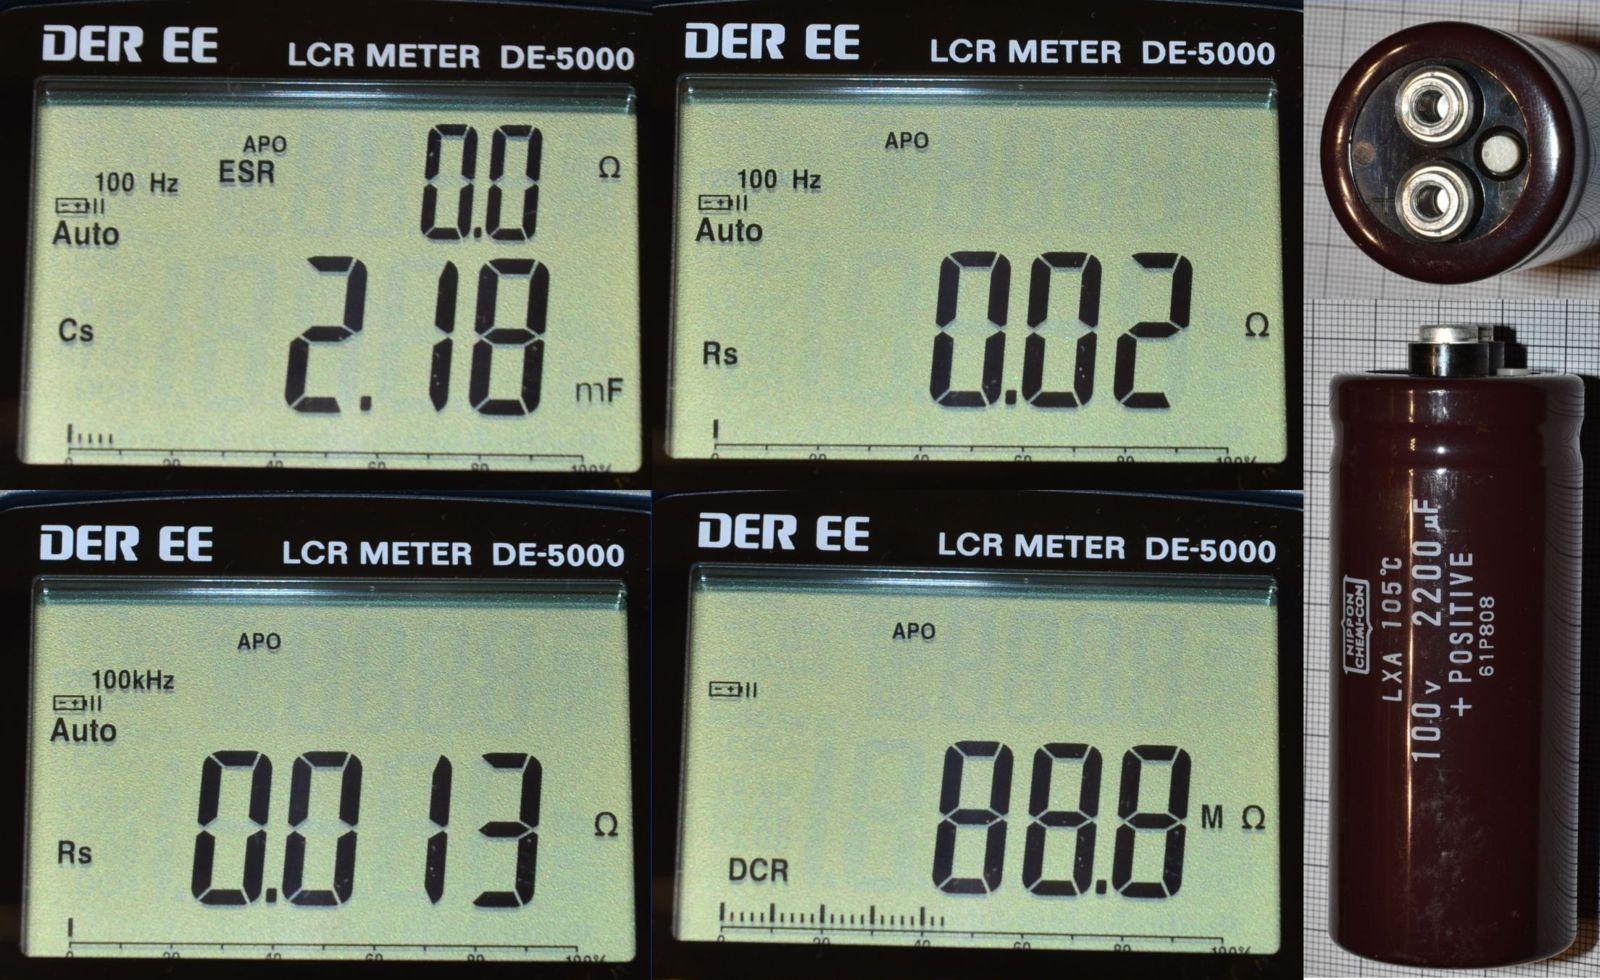 Lcr meter der ee lcr meter manufacturer.